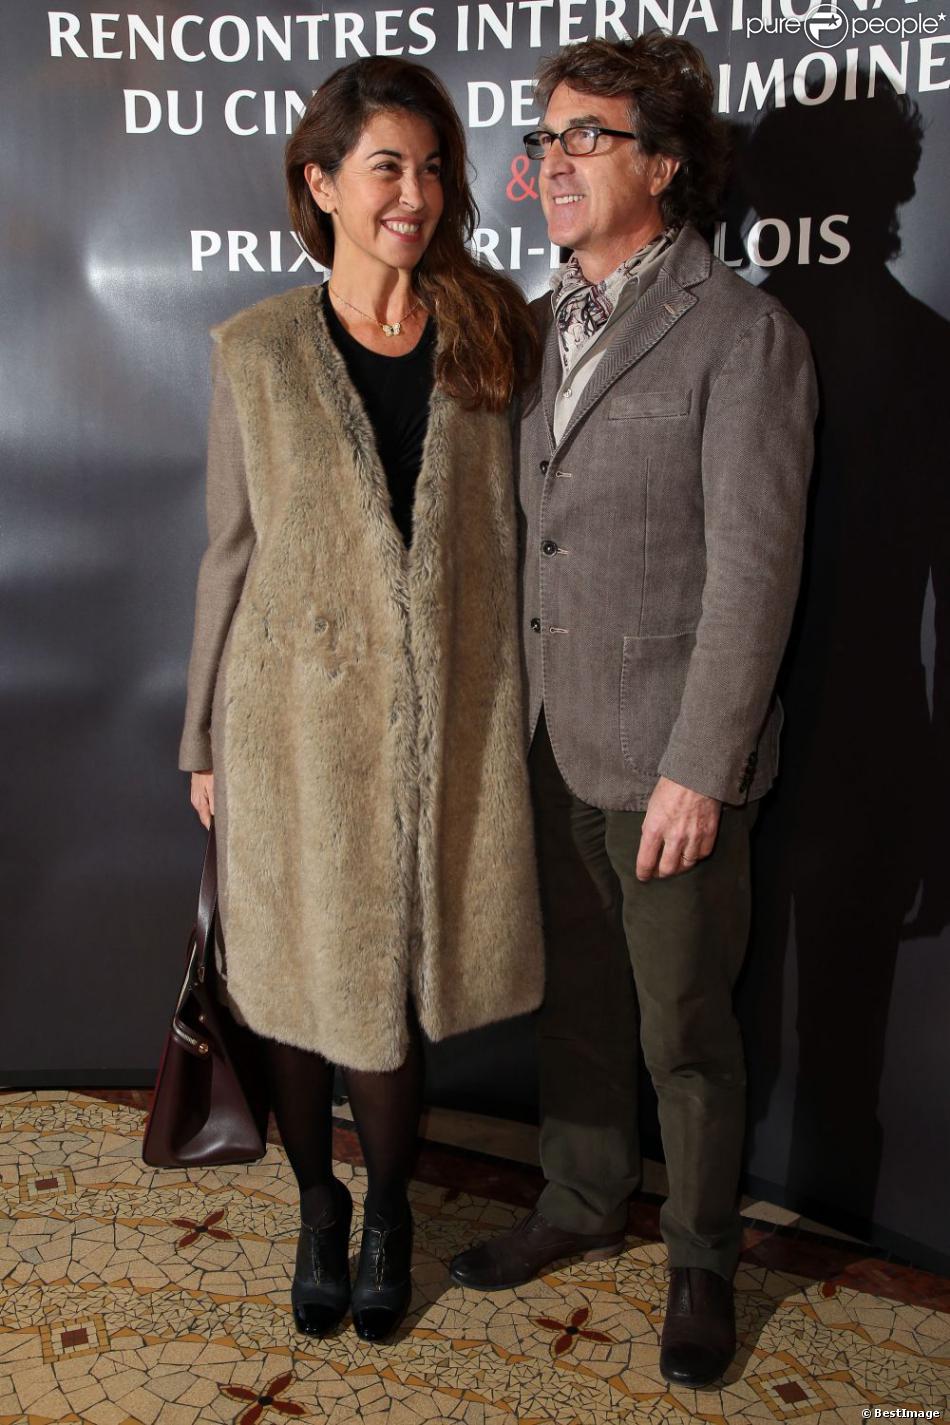 francois cluzet et sa femme narjiss marrakech le 29 novembre 2013 pictures to pin on pinterest. Black Bedroom Furniture Sets. Home Design Ideas